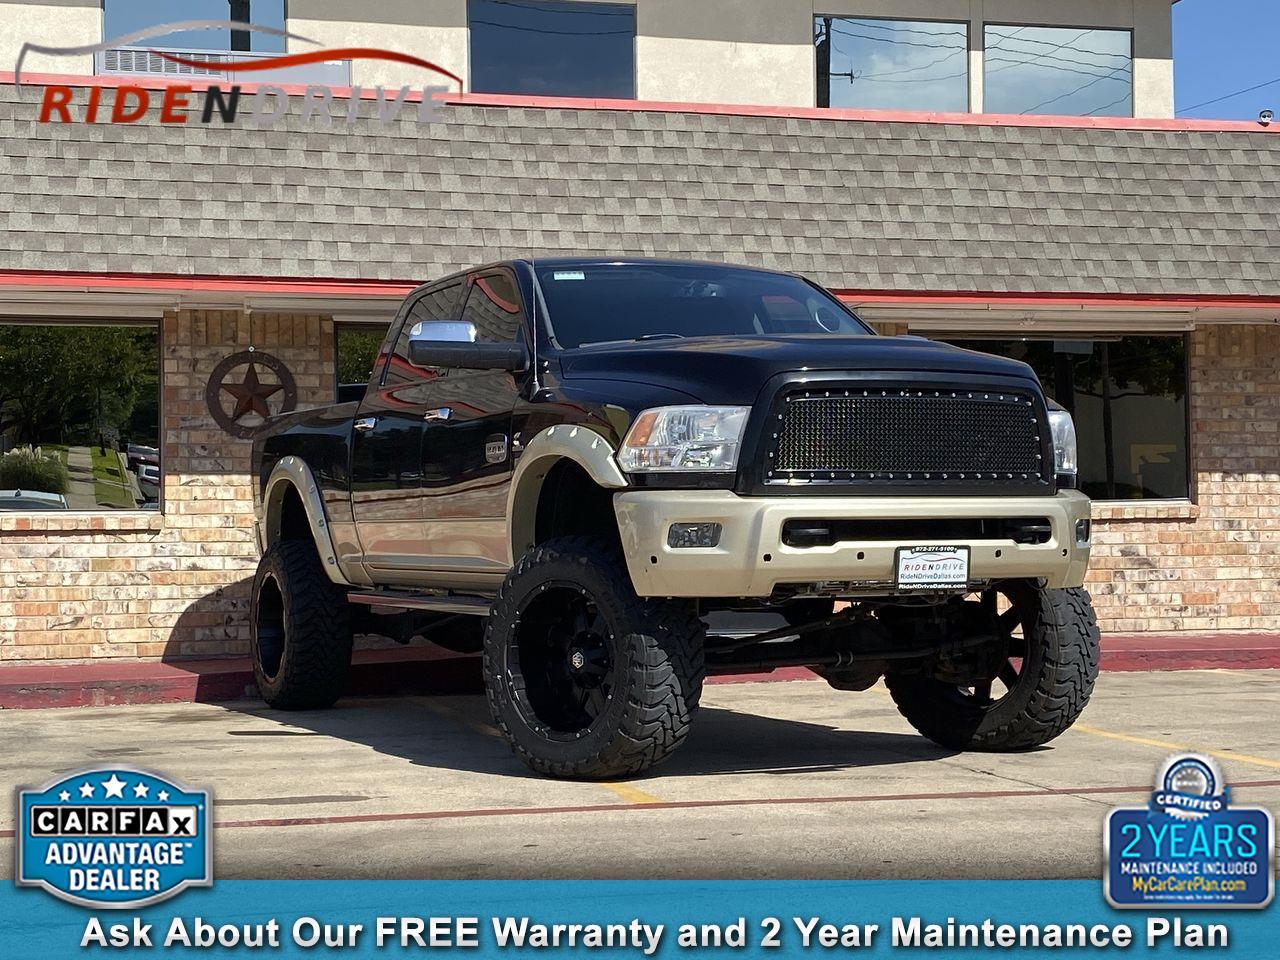 "2011 RAM 2500 4WD Crew Cab 149"" Laramie Longhorn Edition"